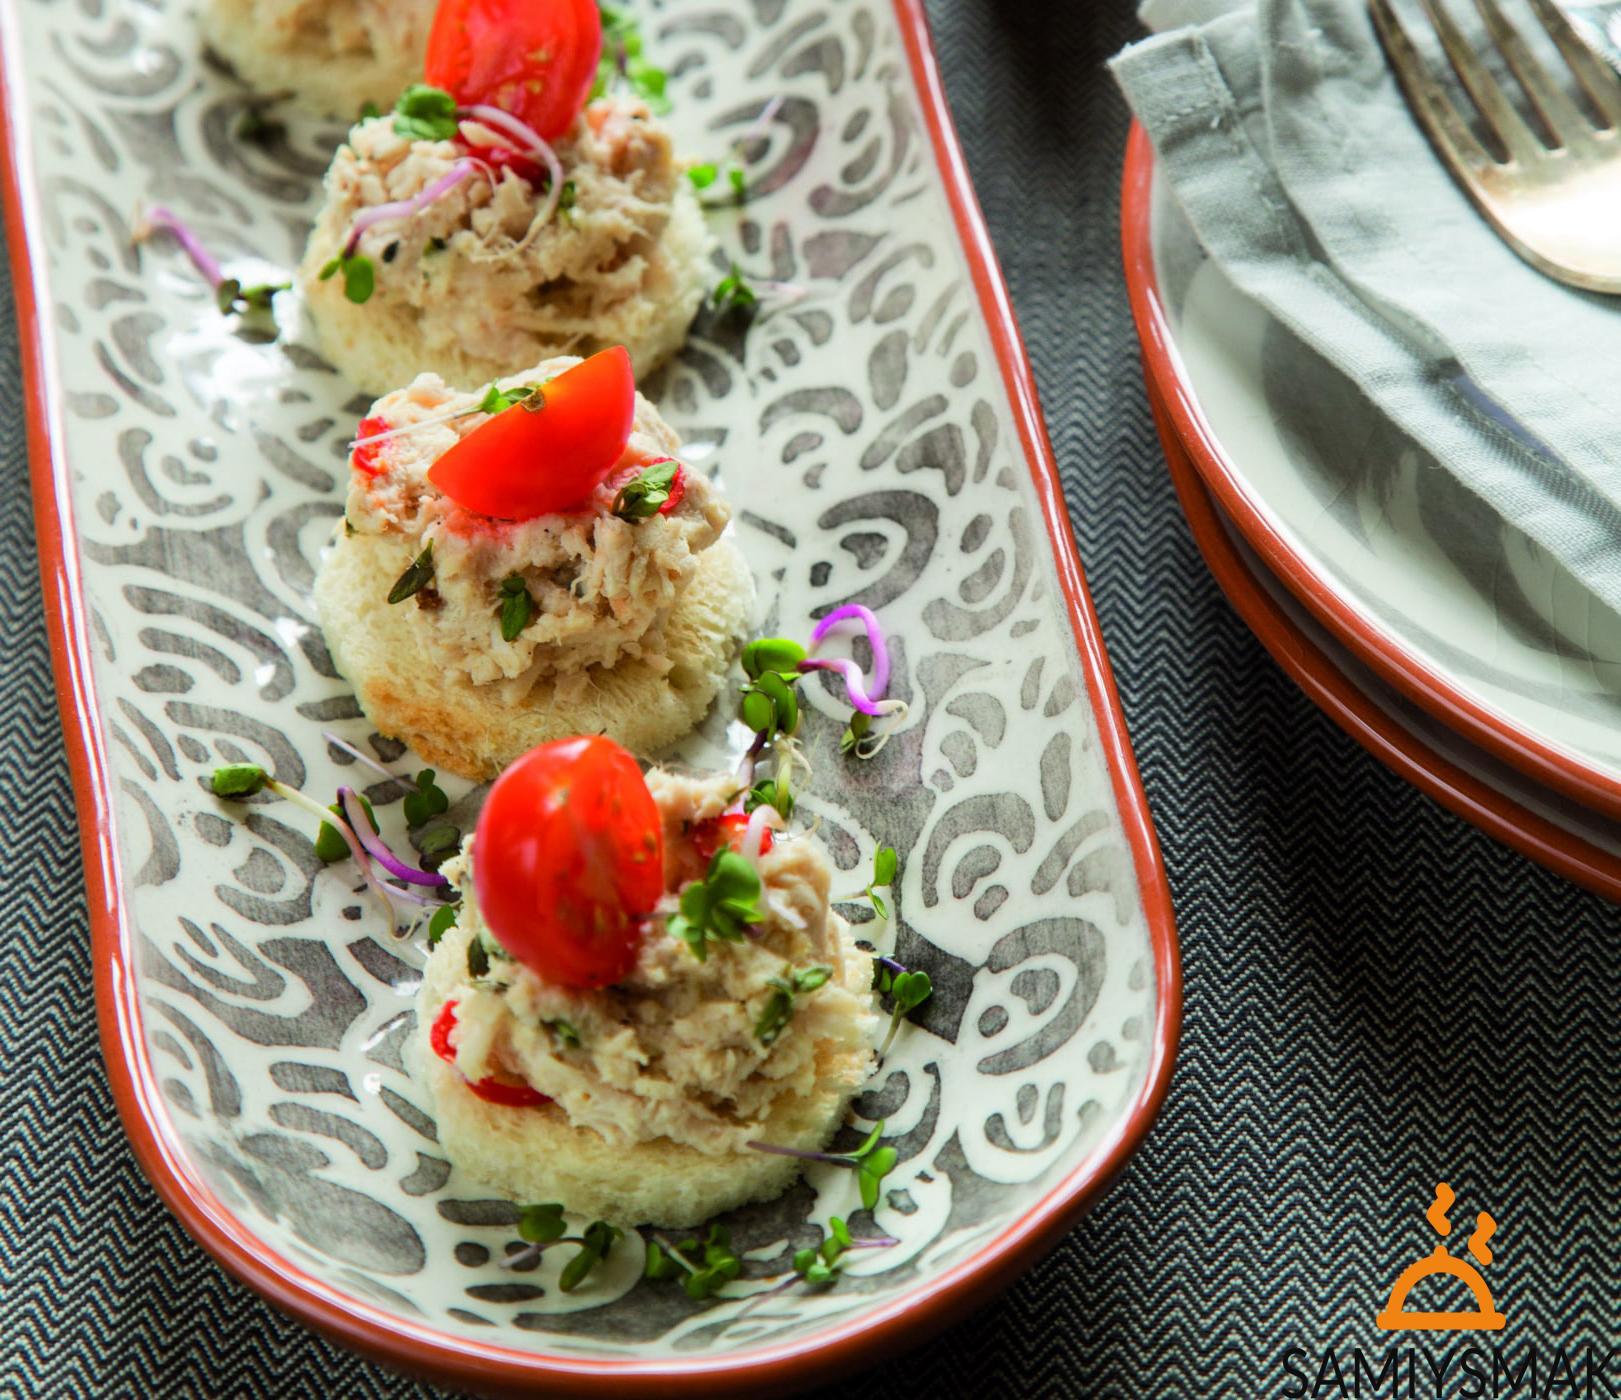 Рецепт канапе с индейкой и помидорами